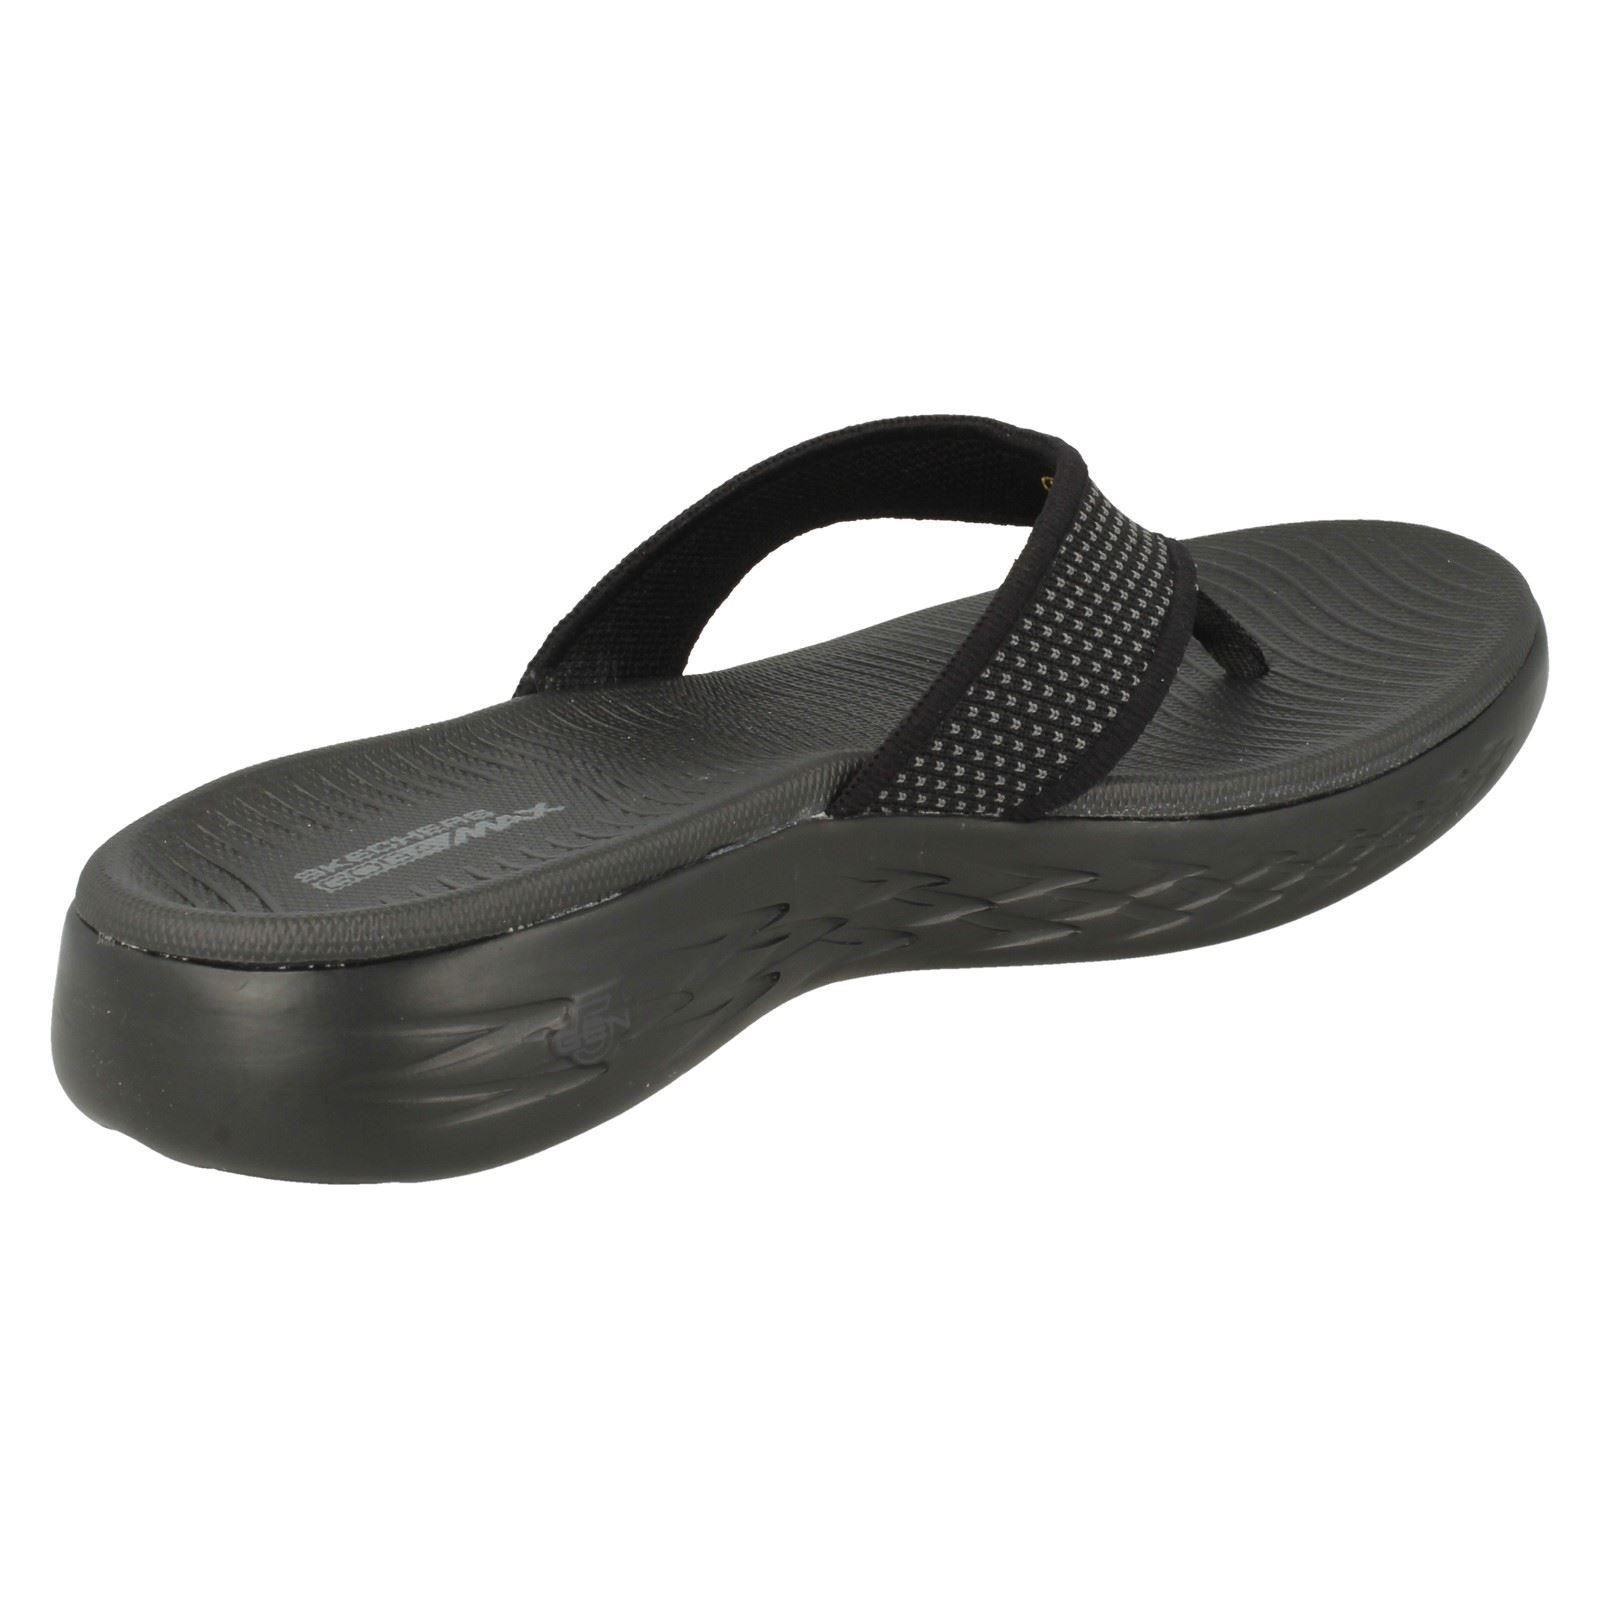 Ladies Skechers Casual Slip On Flip Flip Flip Flops - On The Go 600 15300 54f796